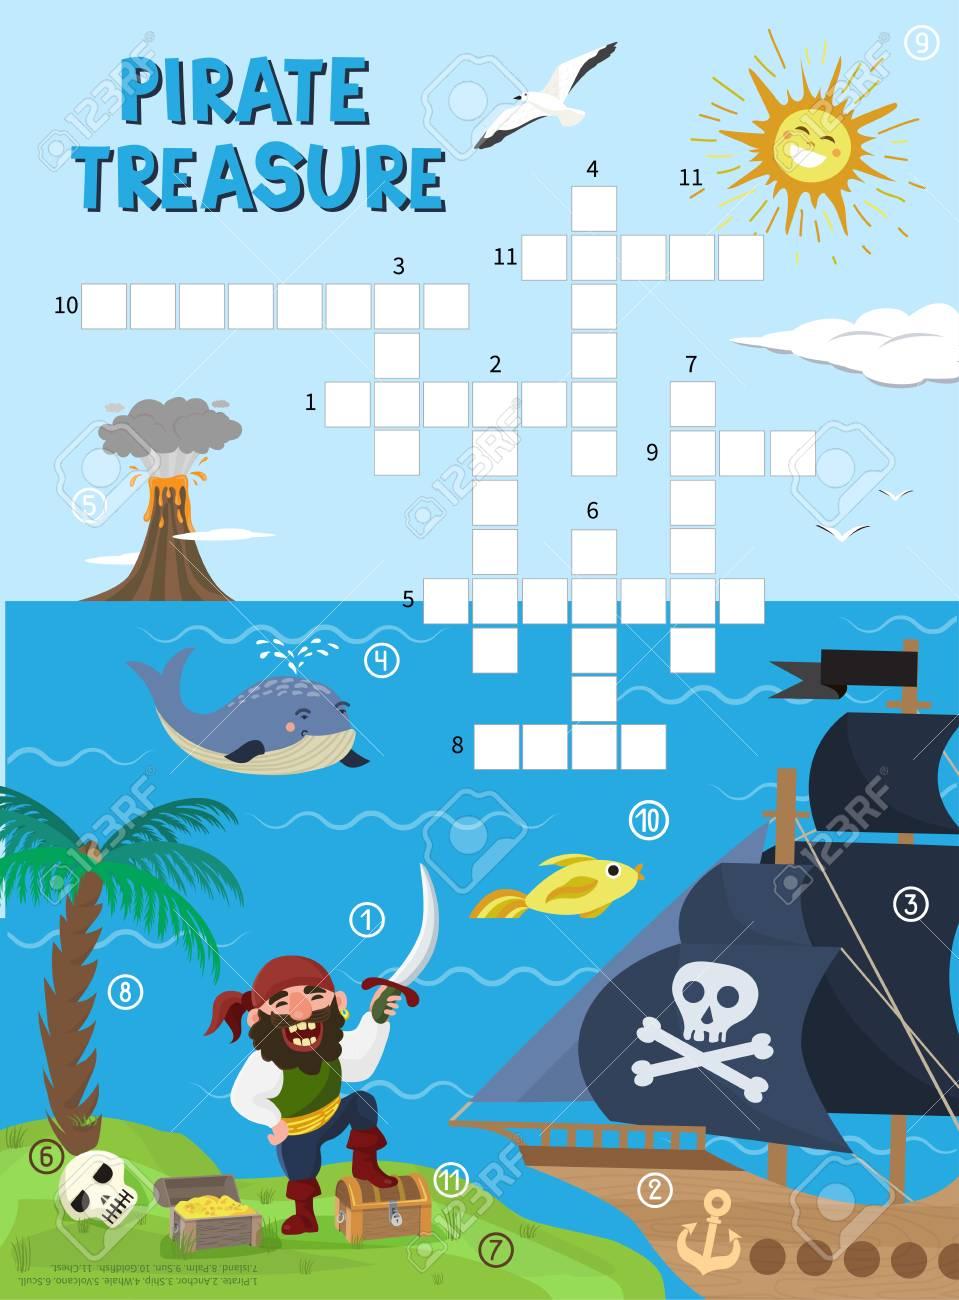 Piratenschatz Abenteuer Kreuzworträtsel Lizenzfrei Nutzbare